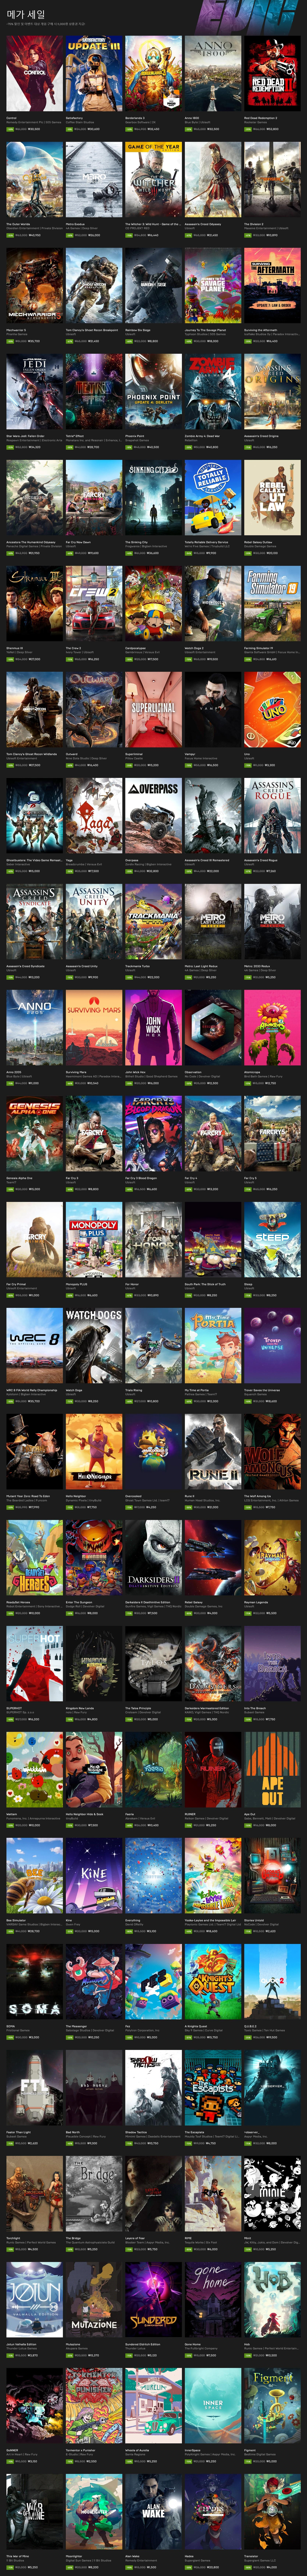 Screenshot_2020-05-15 5월 15일부터 6월 11일까지 진행되는 에픽게임즈 메가 세일에서 할인되는 게임 목록을 확인하세요 .jpg